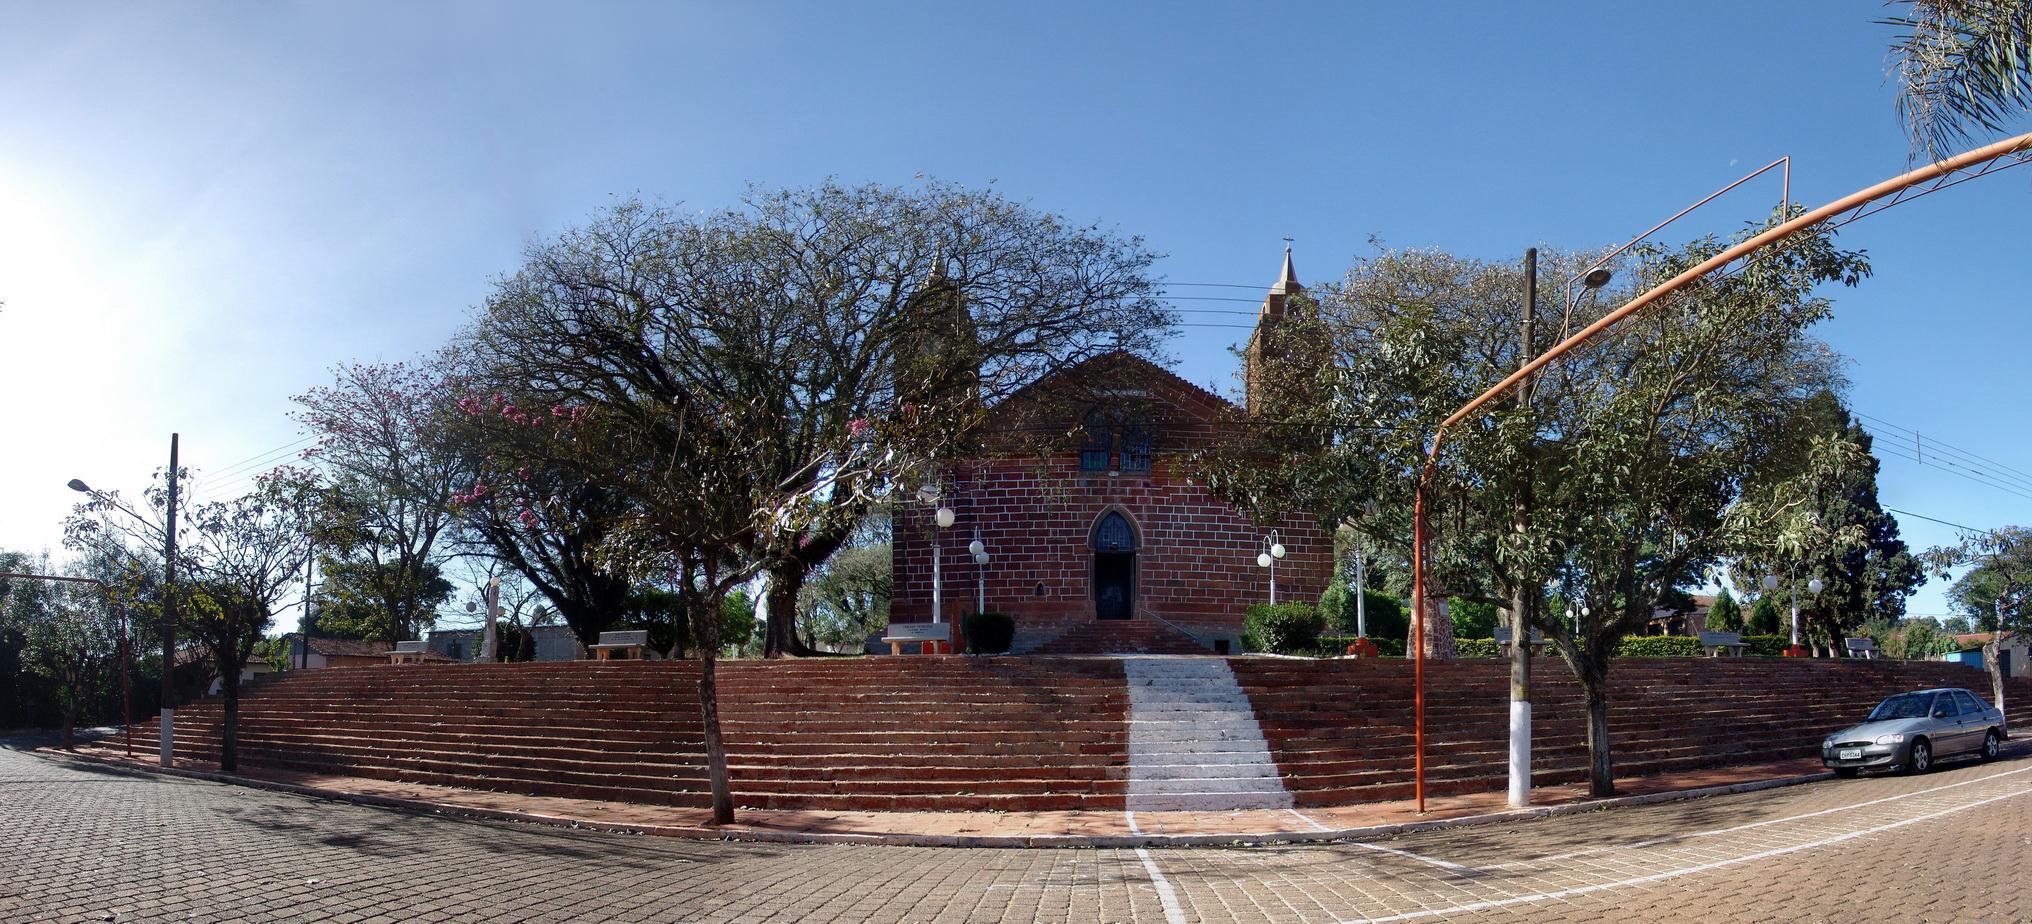 Timburi São Paulo fonte: upload.wikimedia.org